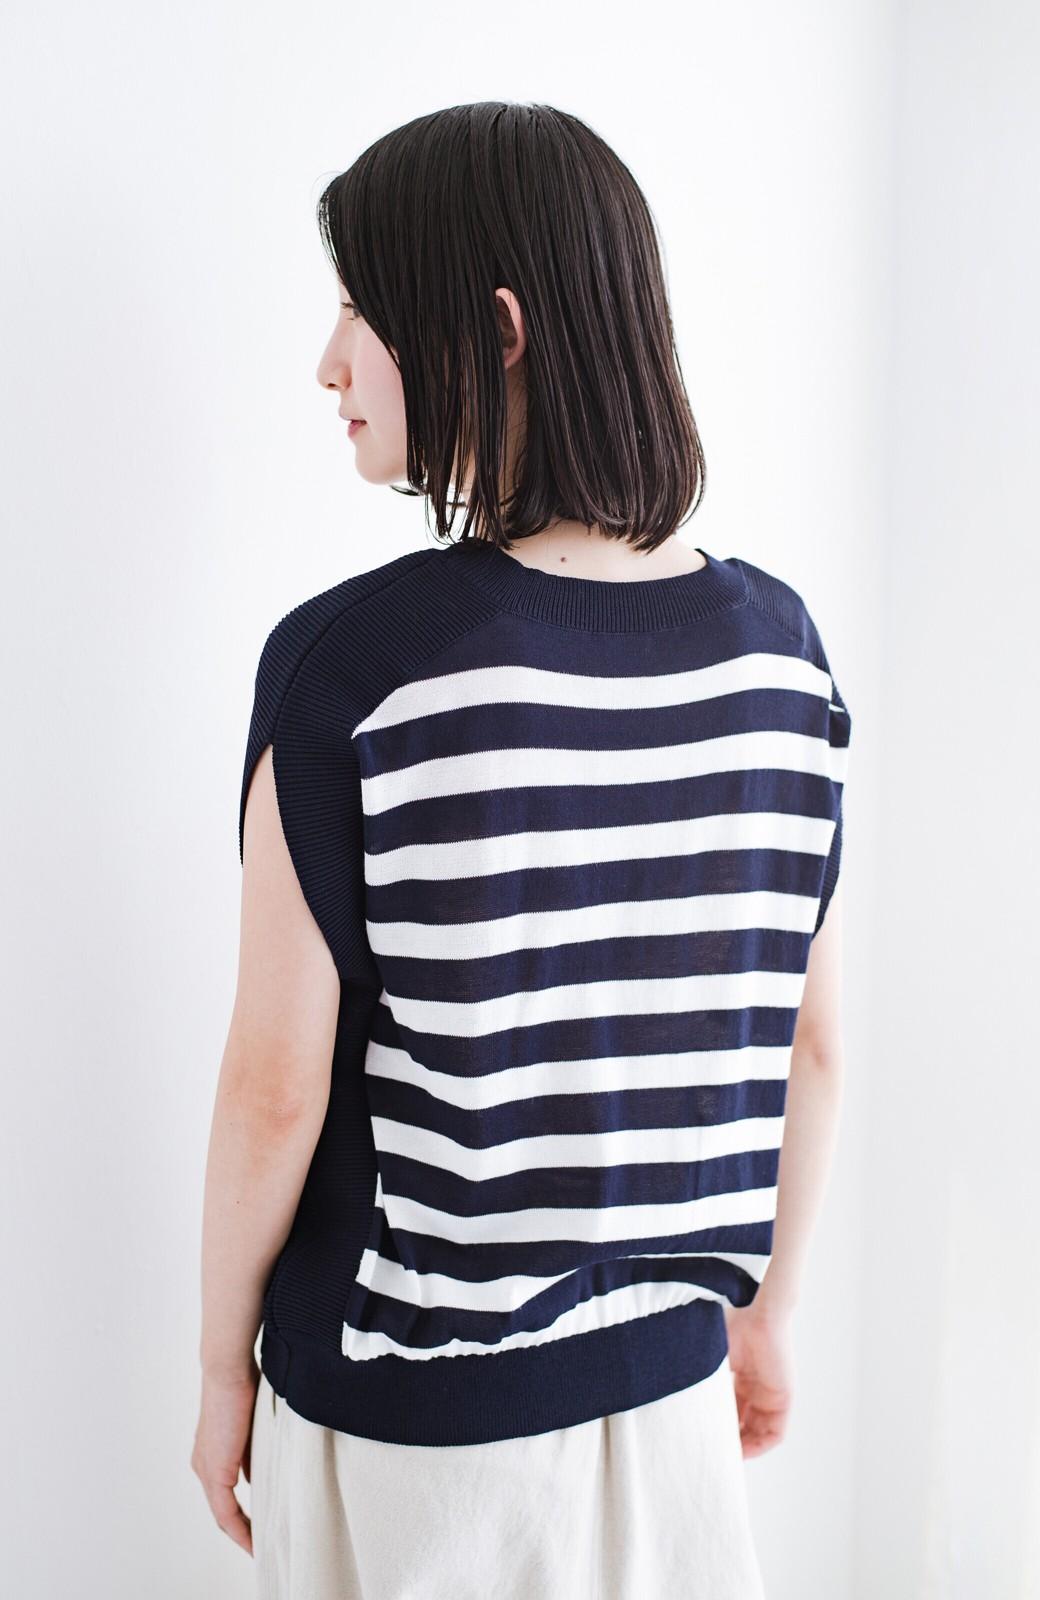 haco! カットソー感覚で着られる 洗えるオトナニットトップス by MAKORI <ブルー系その他>の商品写真15